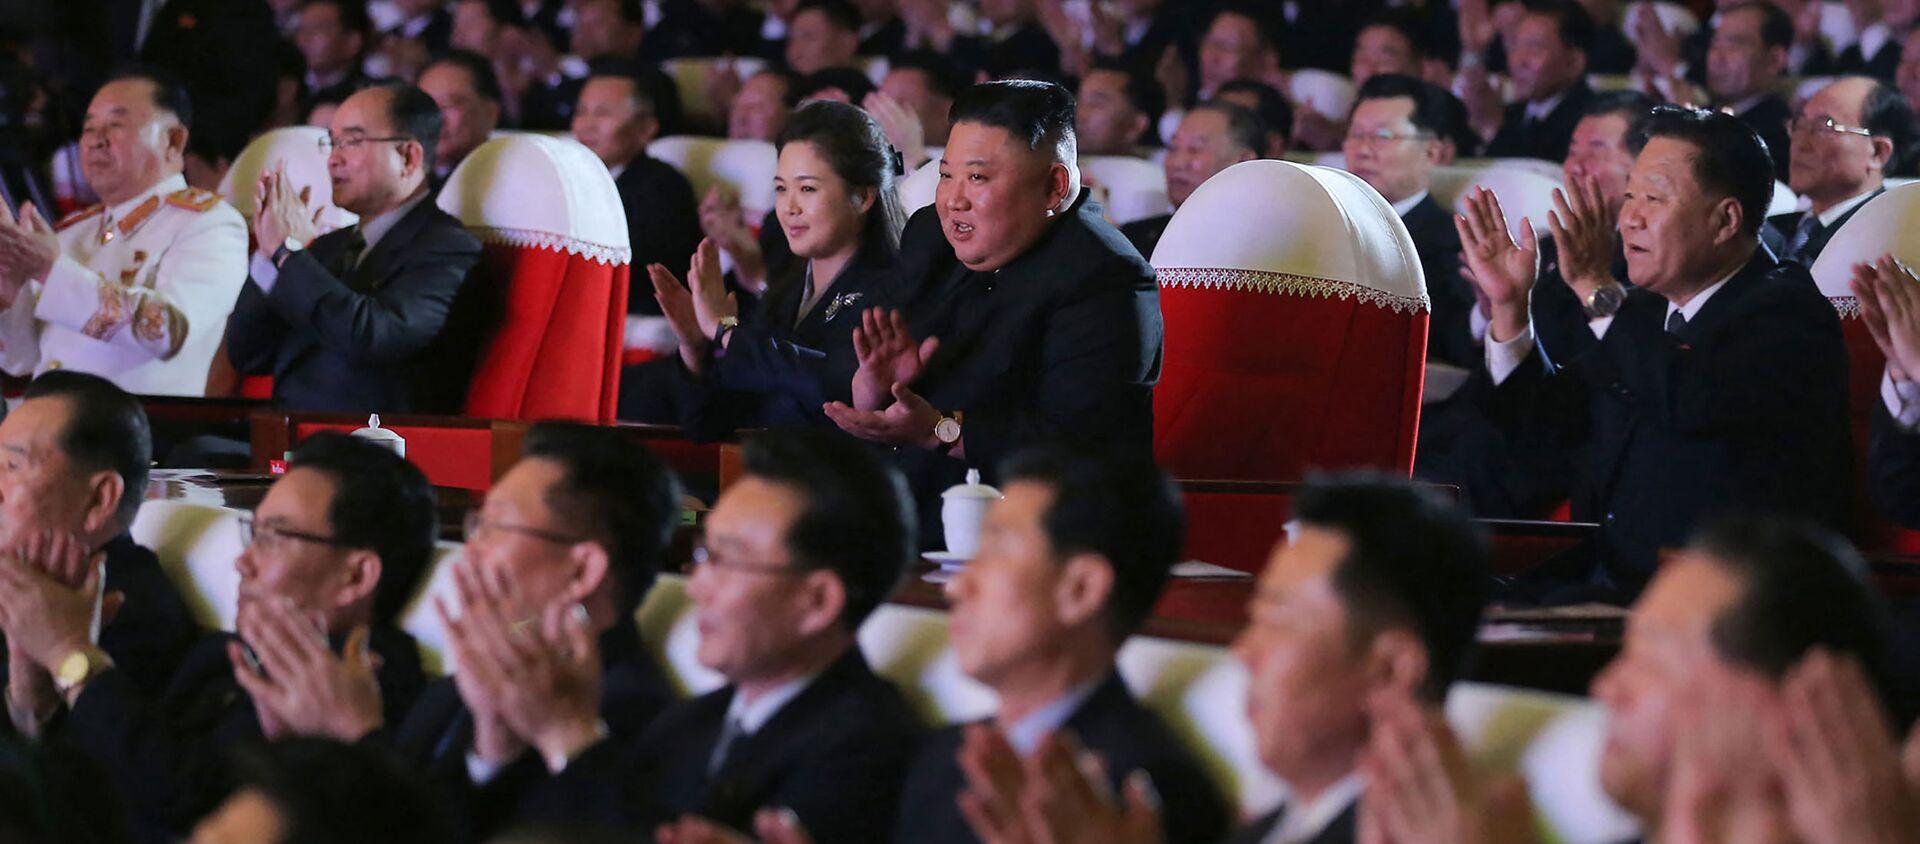 Korea Północna Kim Jong Un Kim Jong Un Lee Seol Joo Ri Sol Ju żona występ muzyczny - Sputnik Polska, 1920, 17.02.2021